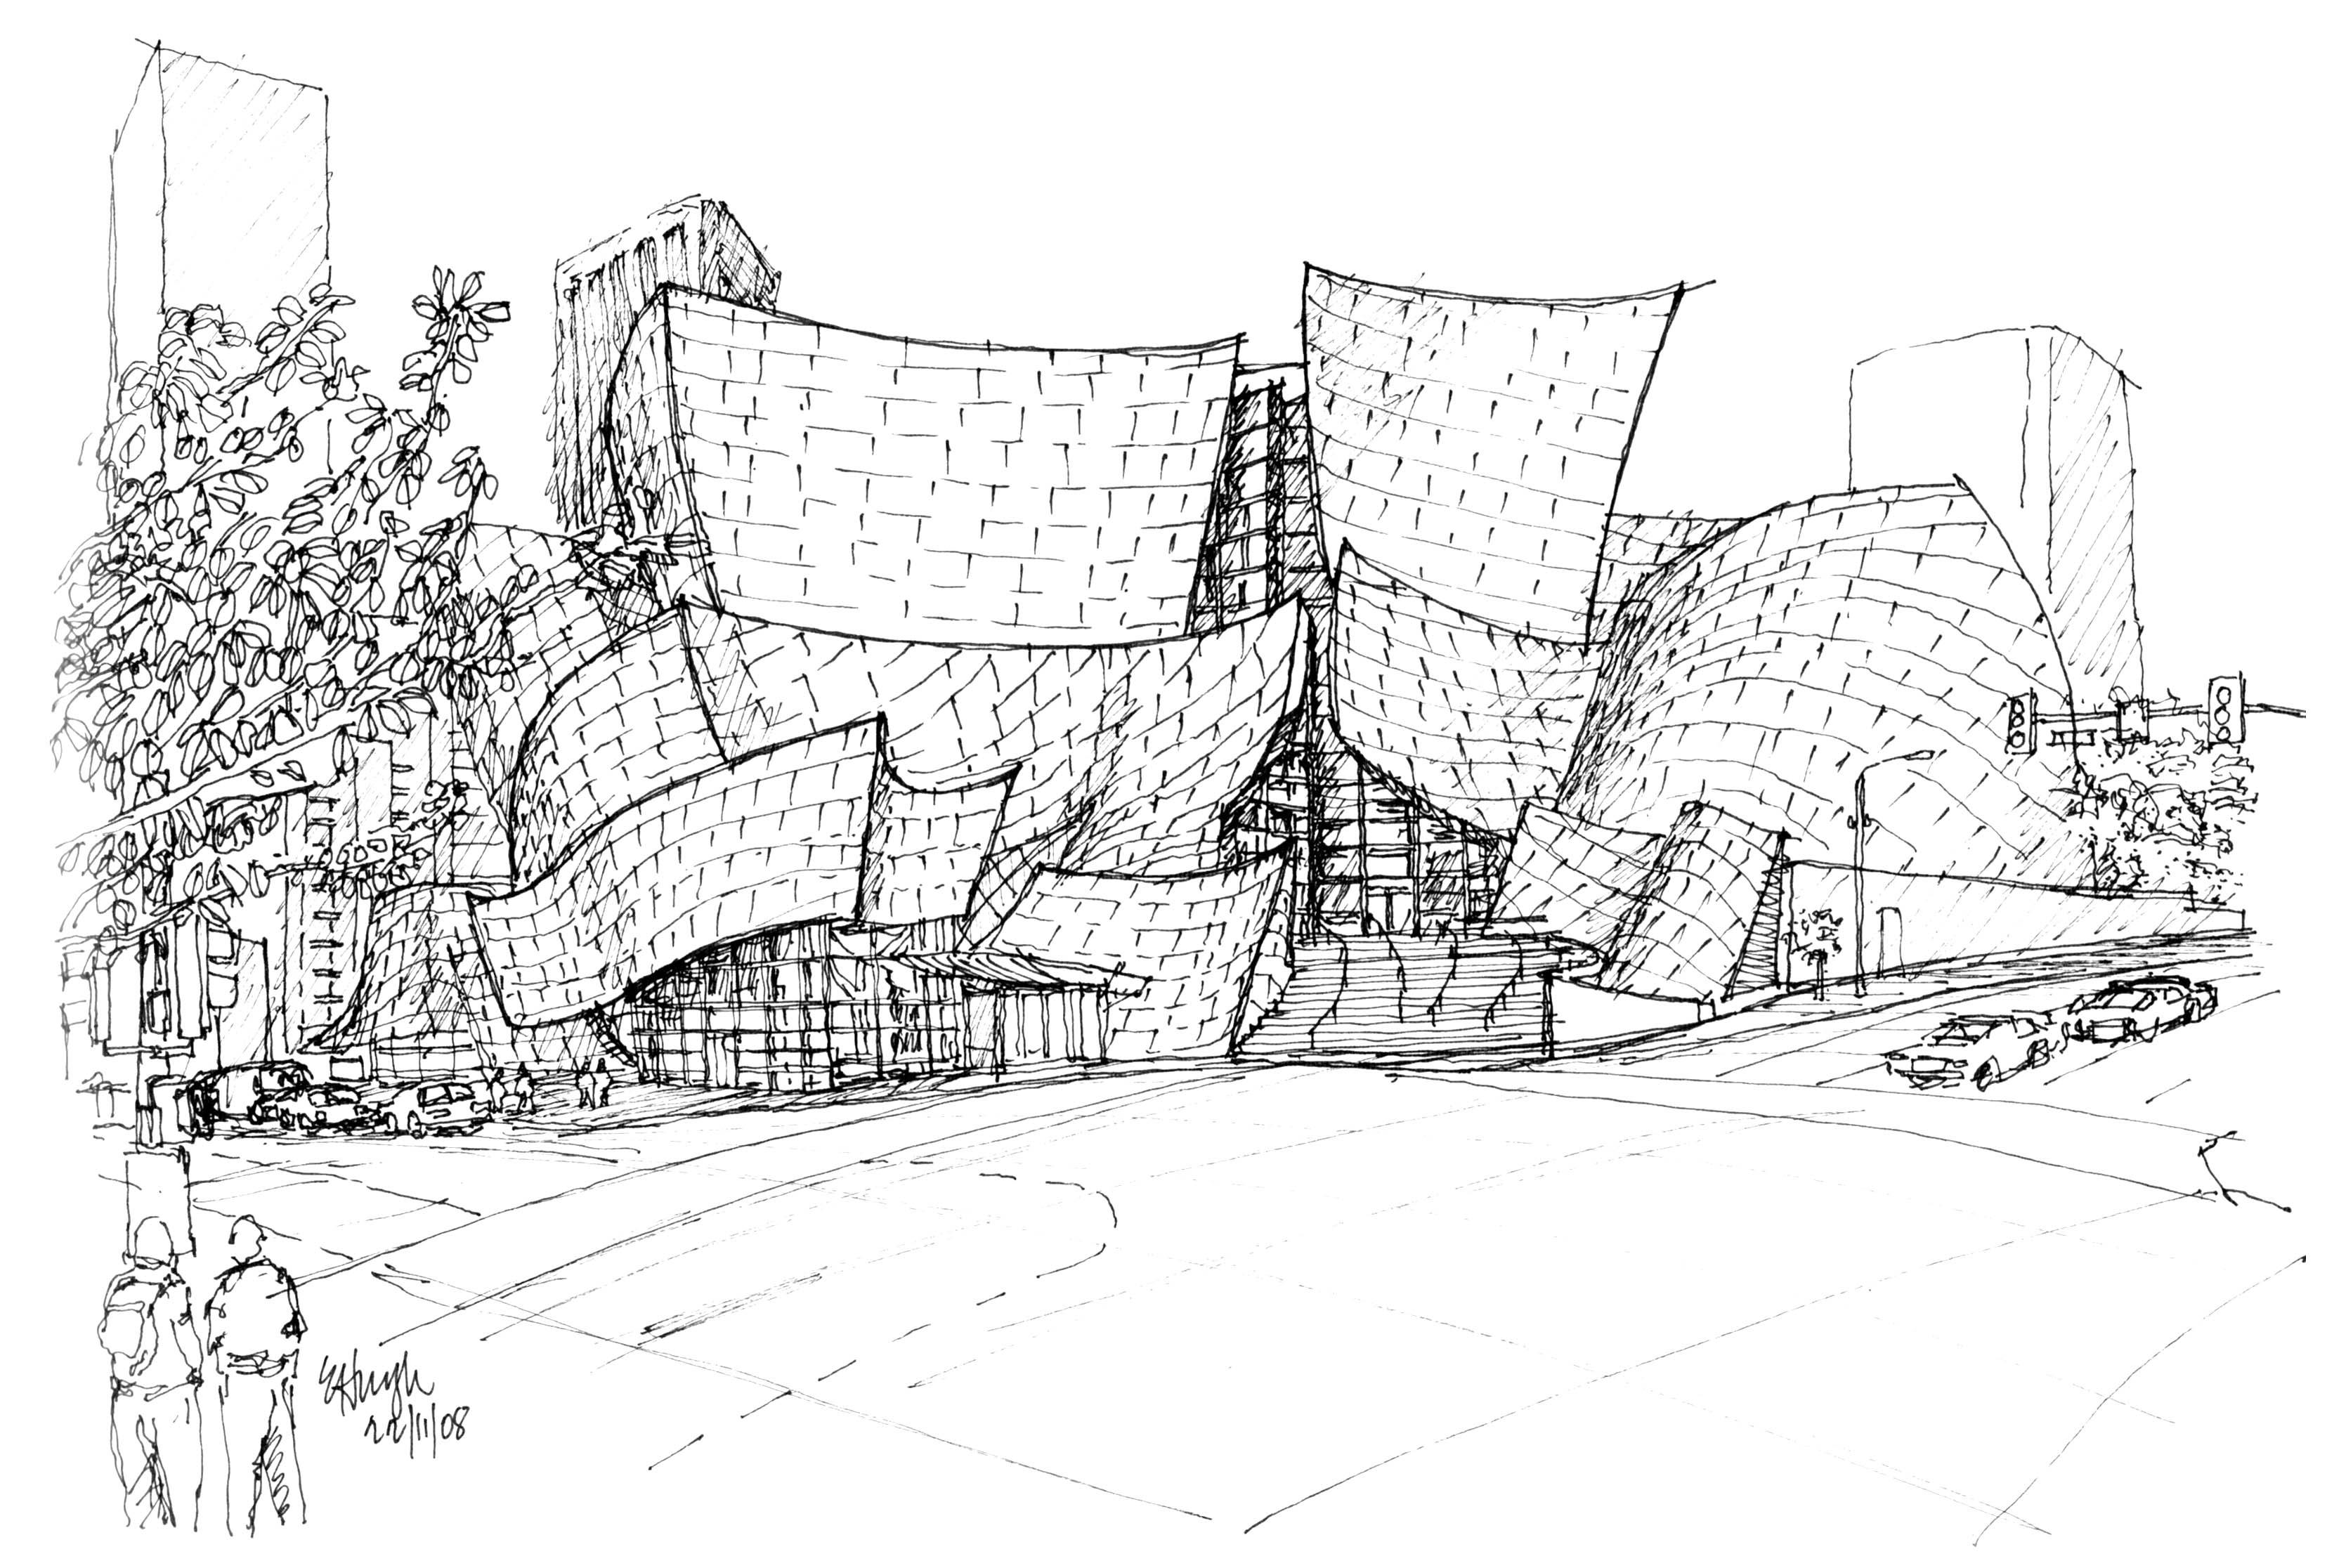 Walt Disney Concert Hall Floor Plan Sketching To Capture The Essence Of An Iconic Design